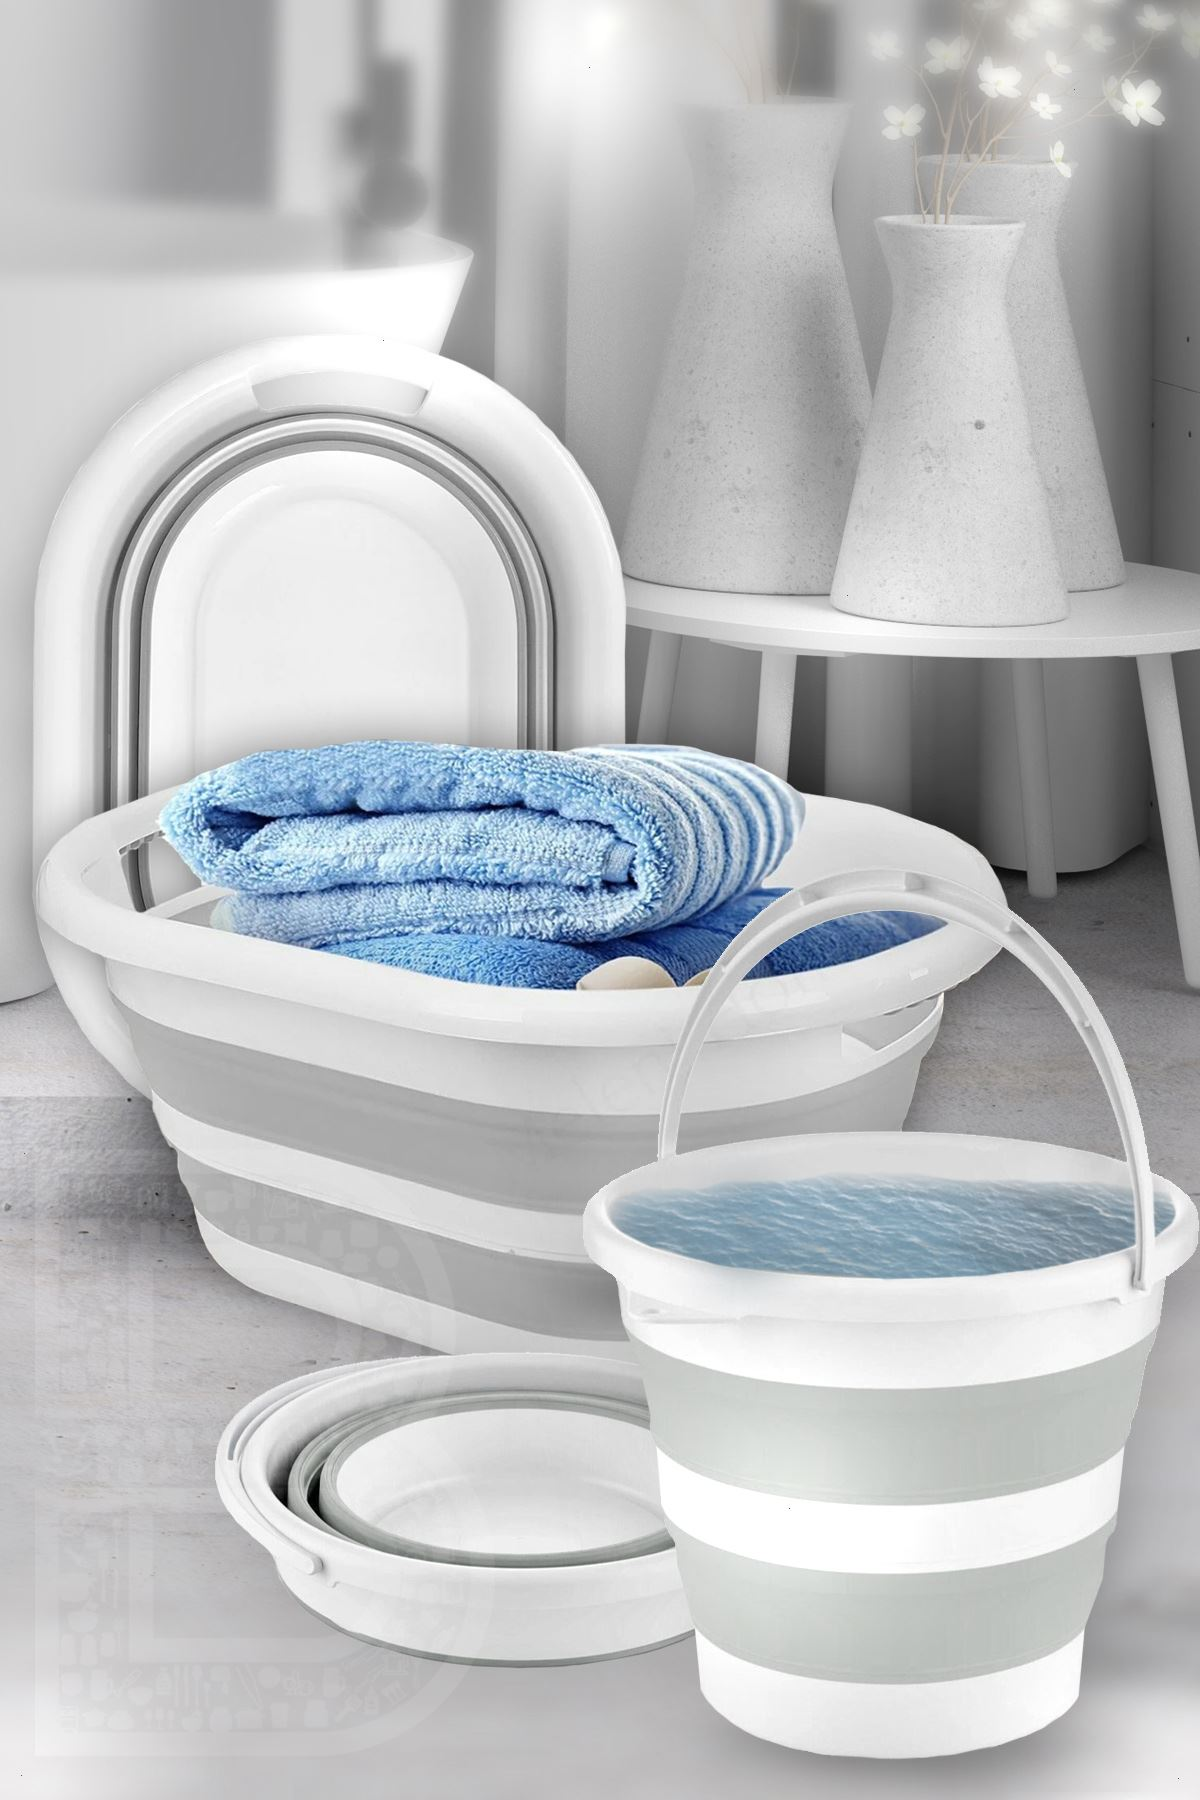 Kitchen Trend 2'li Set Katlanır Çamaşır Sepeti, Katlanabilir Akordeon Su Kovası